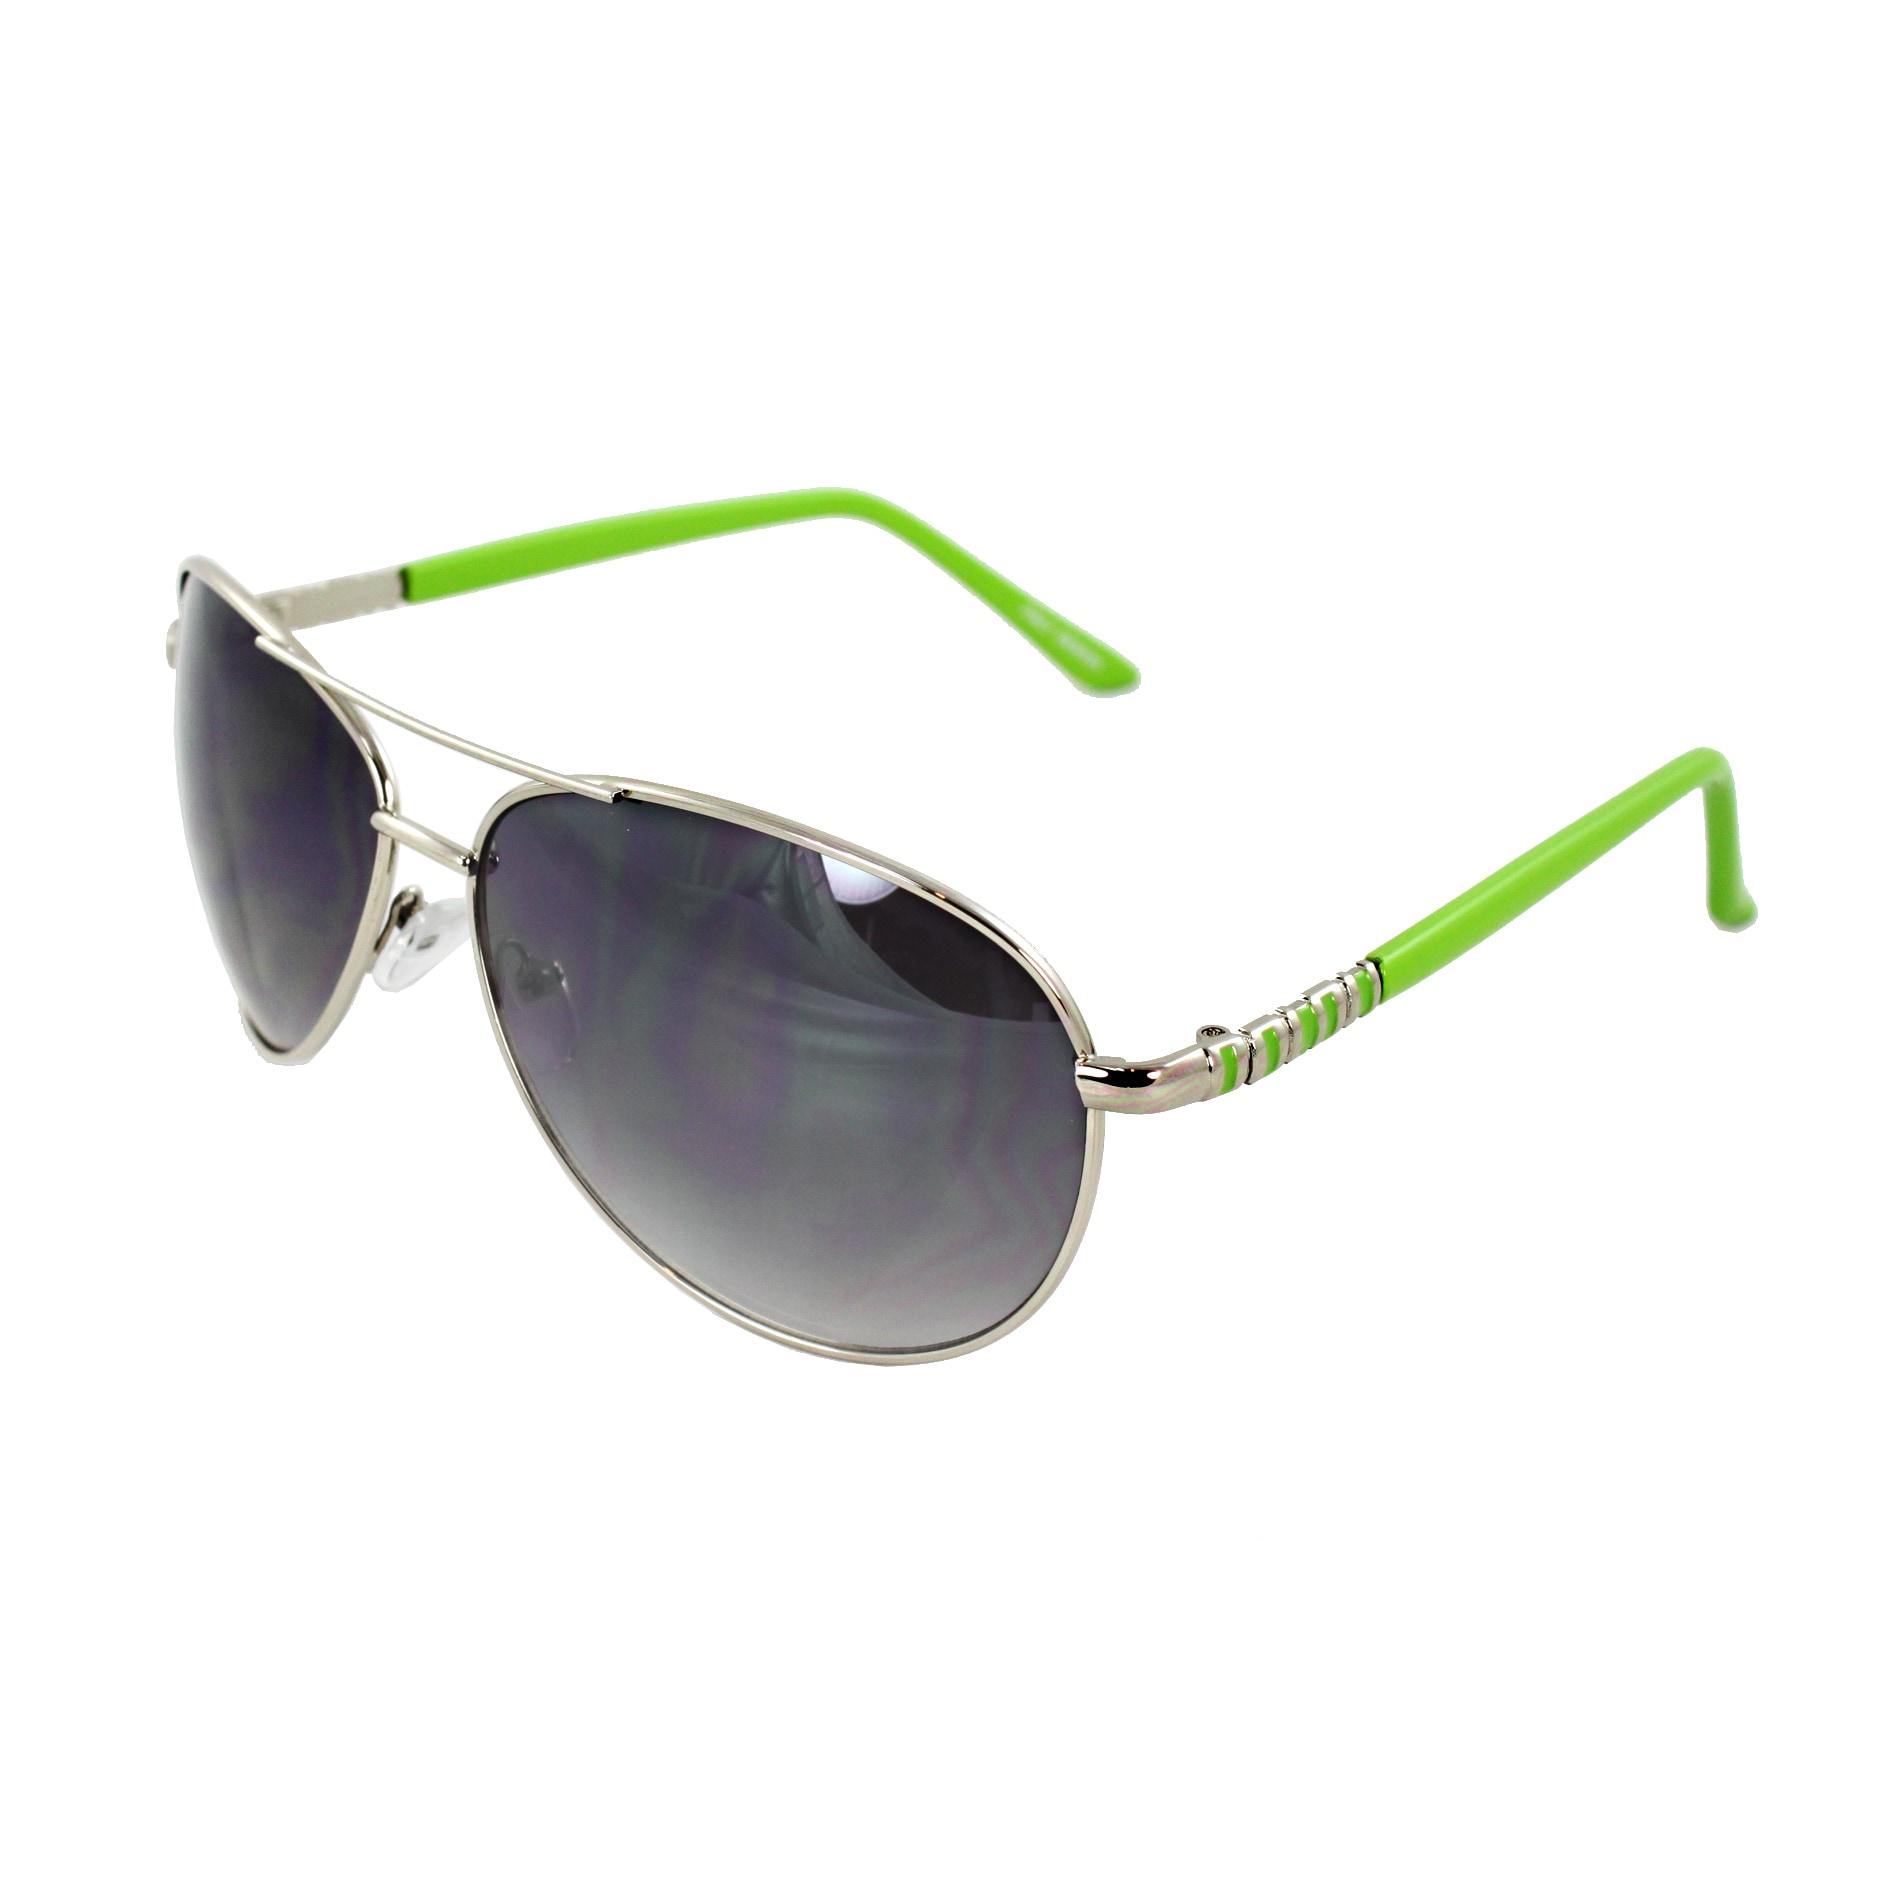 Green Frame Fashion Glasses : Pilot Fashion Aviator Sunglasses Silver and Green Frame ...